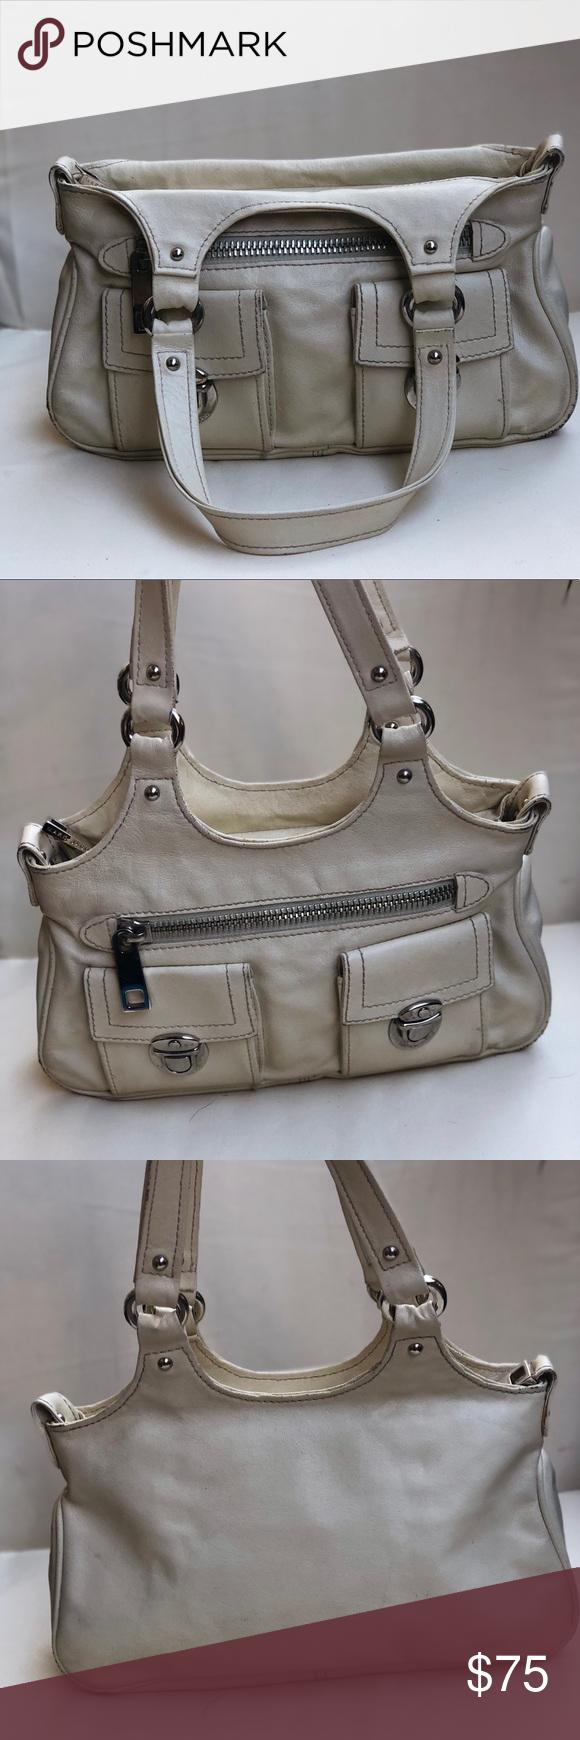 Marc Jacobs Vintage Handbag Handbag Vintage Handbags Marc Jacobs Bag